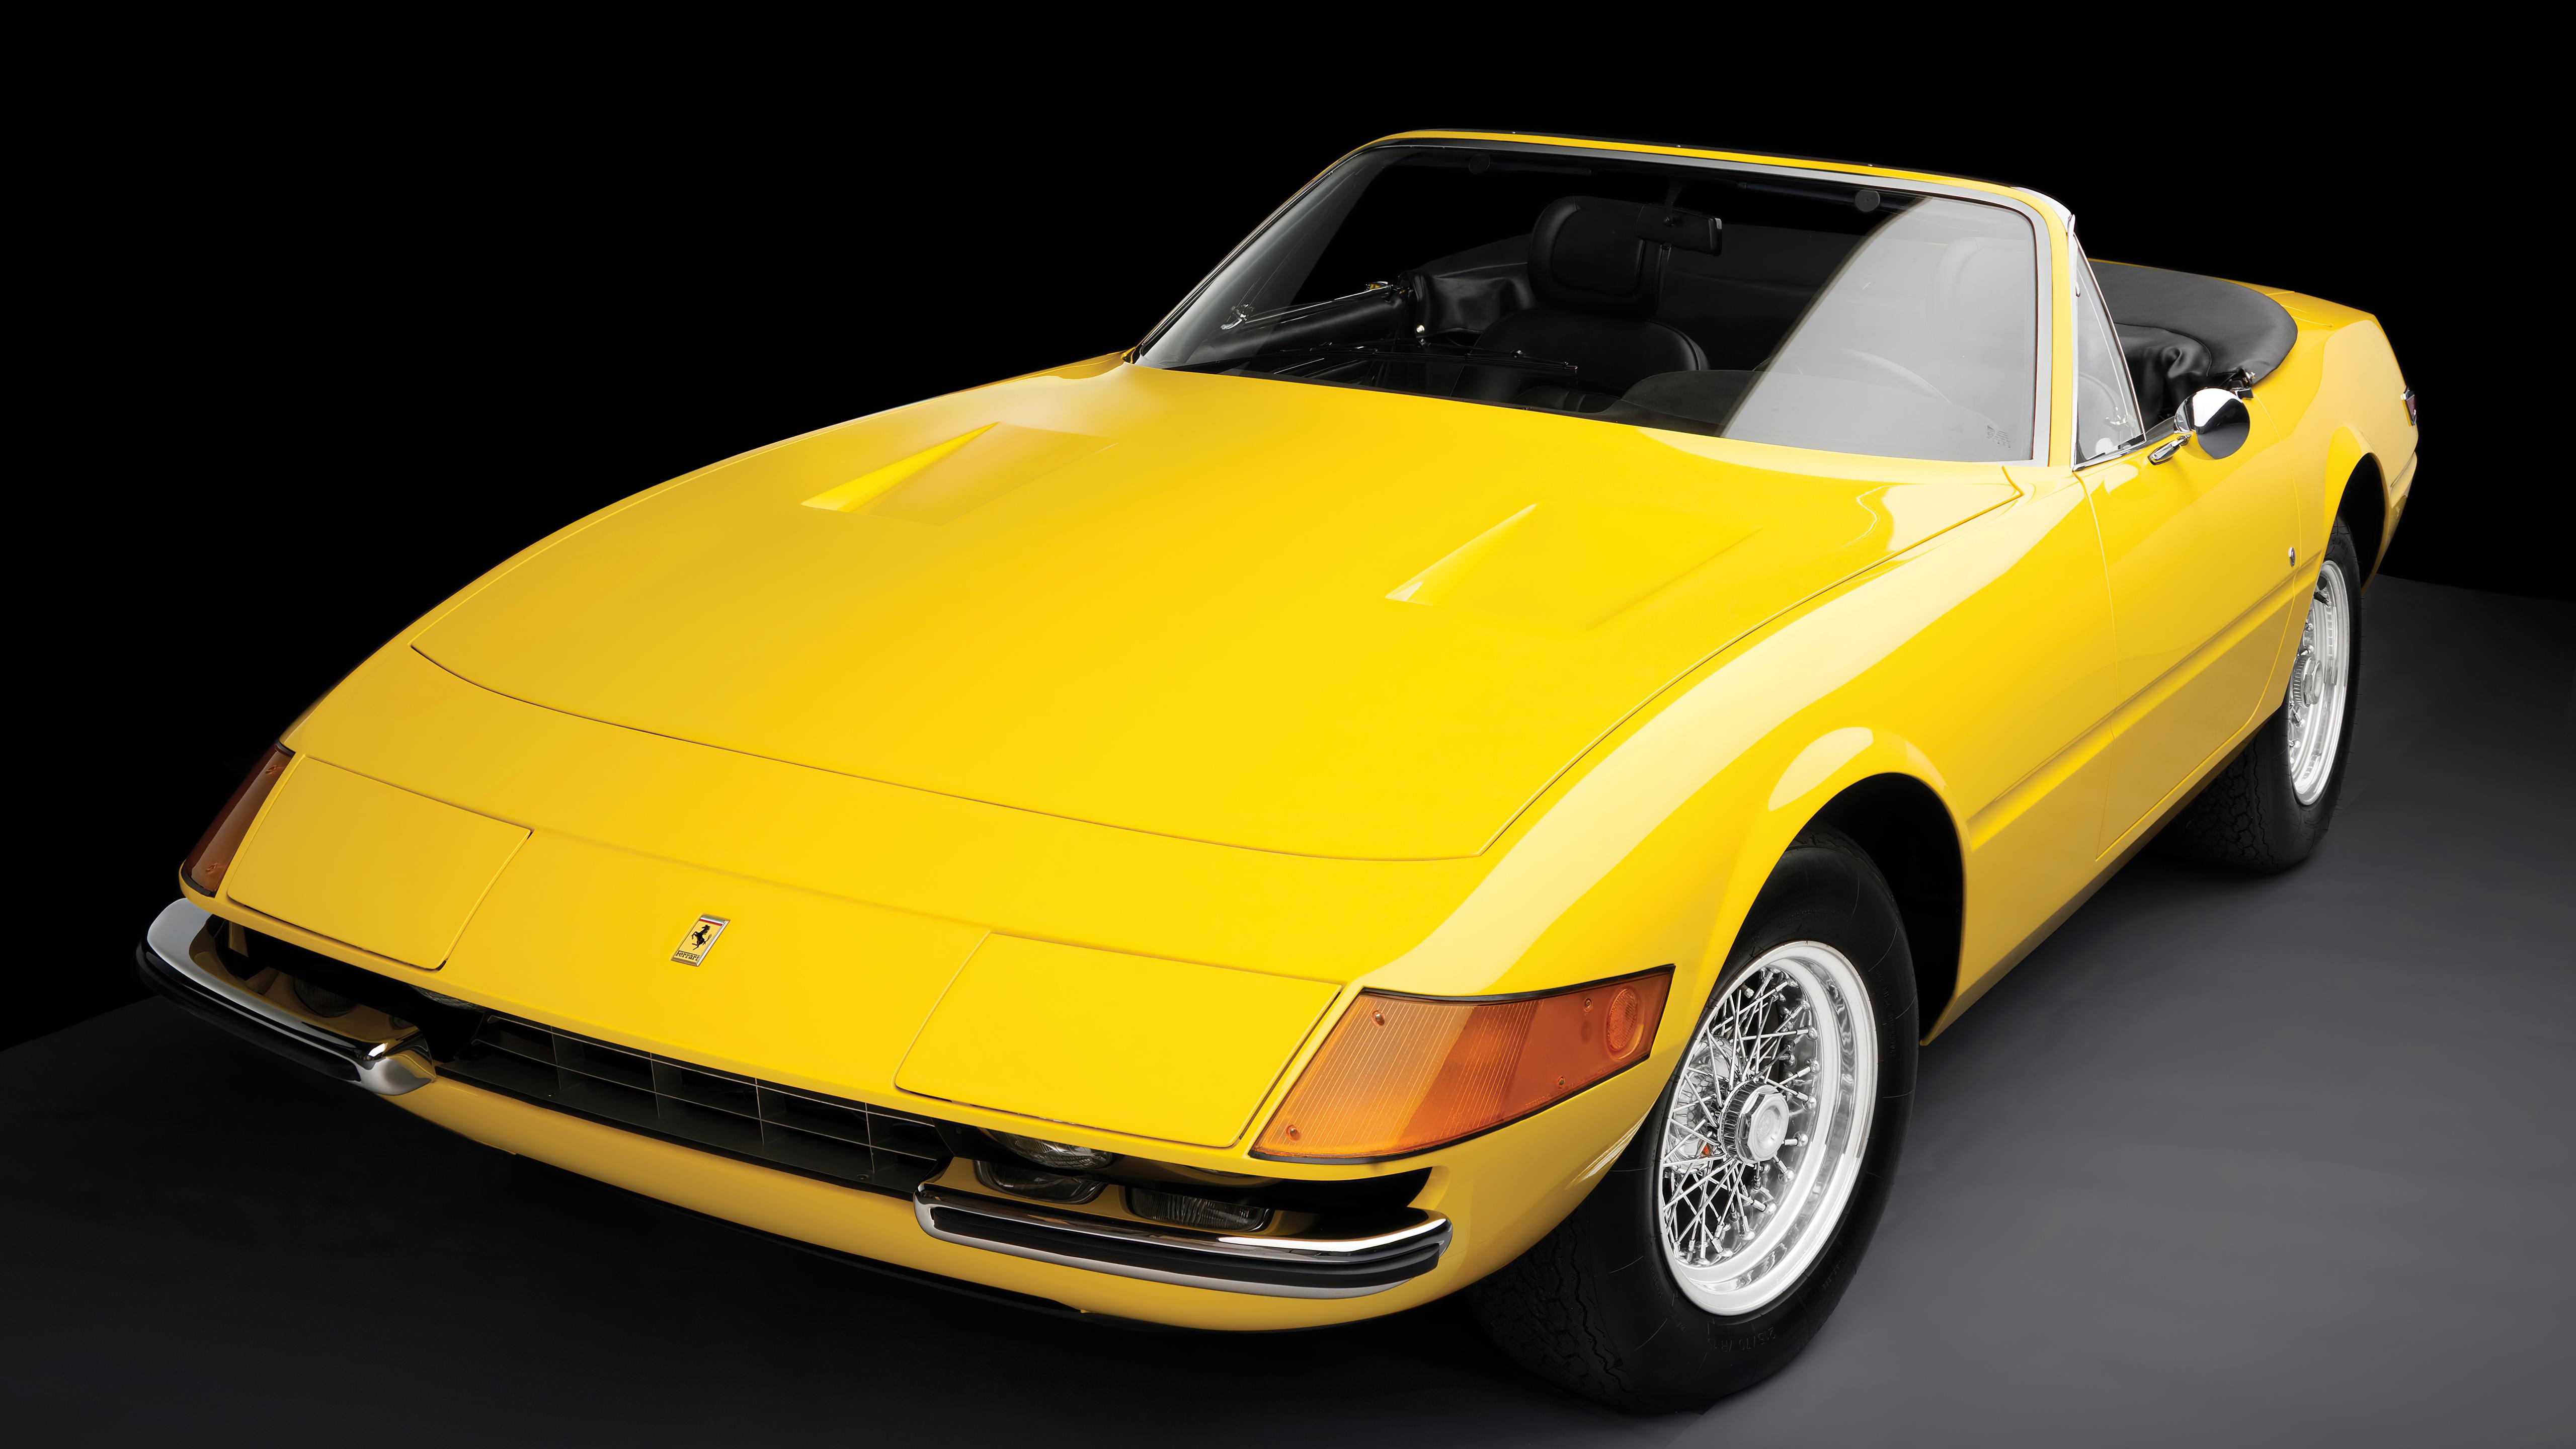 ferrari 365 gts daytona 4k 1614632404 - Ferrari 365 GTS Daytona 4k - Ferrari 365 GTS Daytona 4k wallpapers